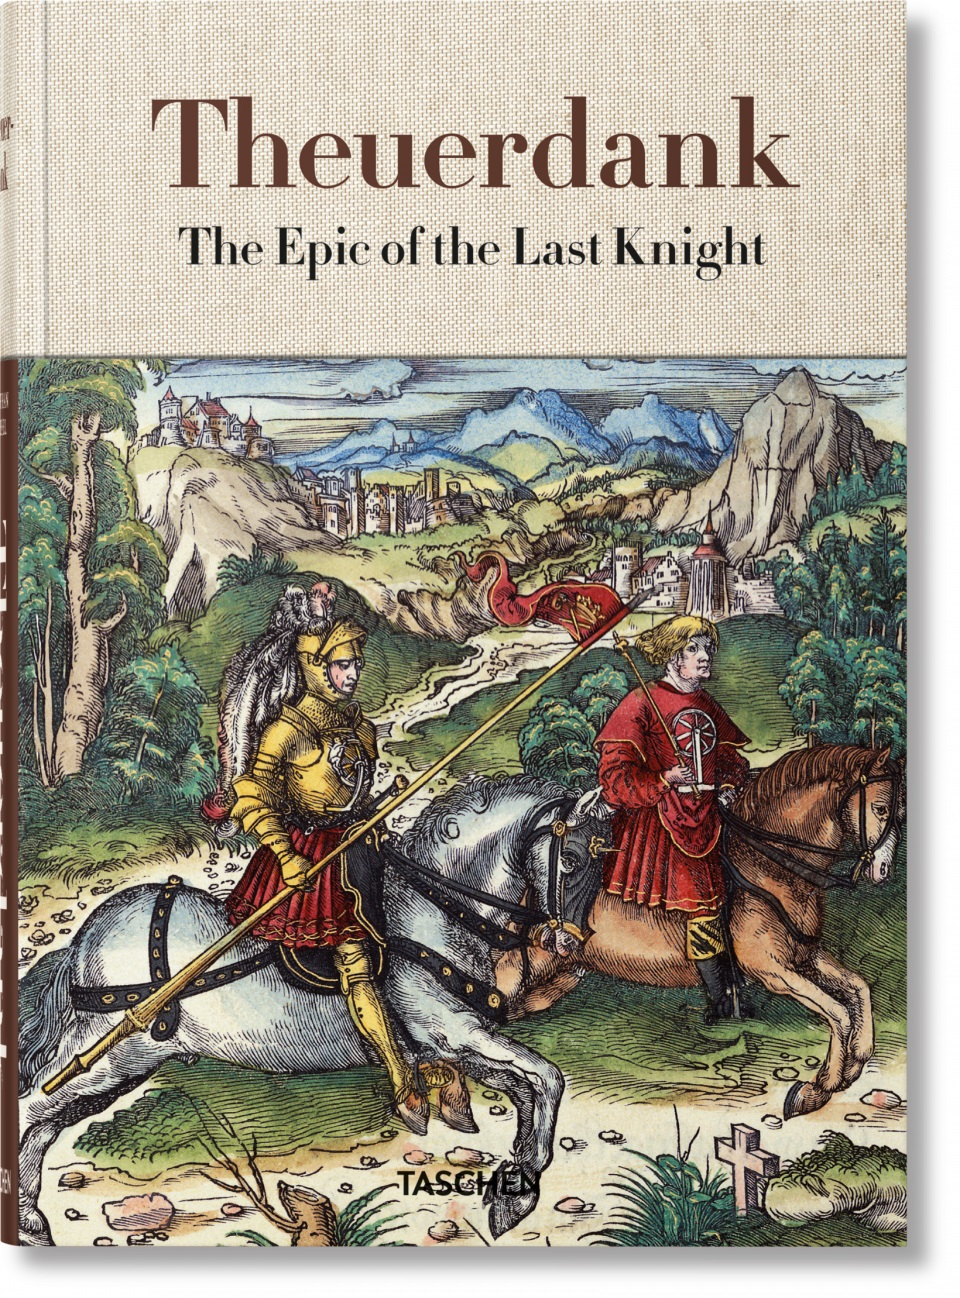 Knight Theuerdank, an epic tale of Maxmilian I